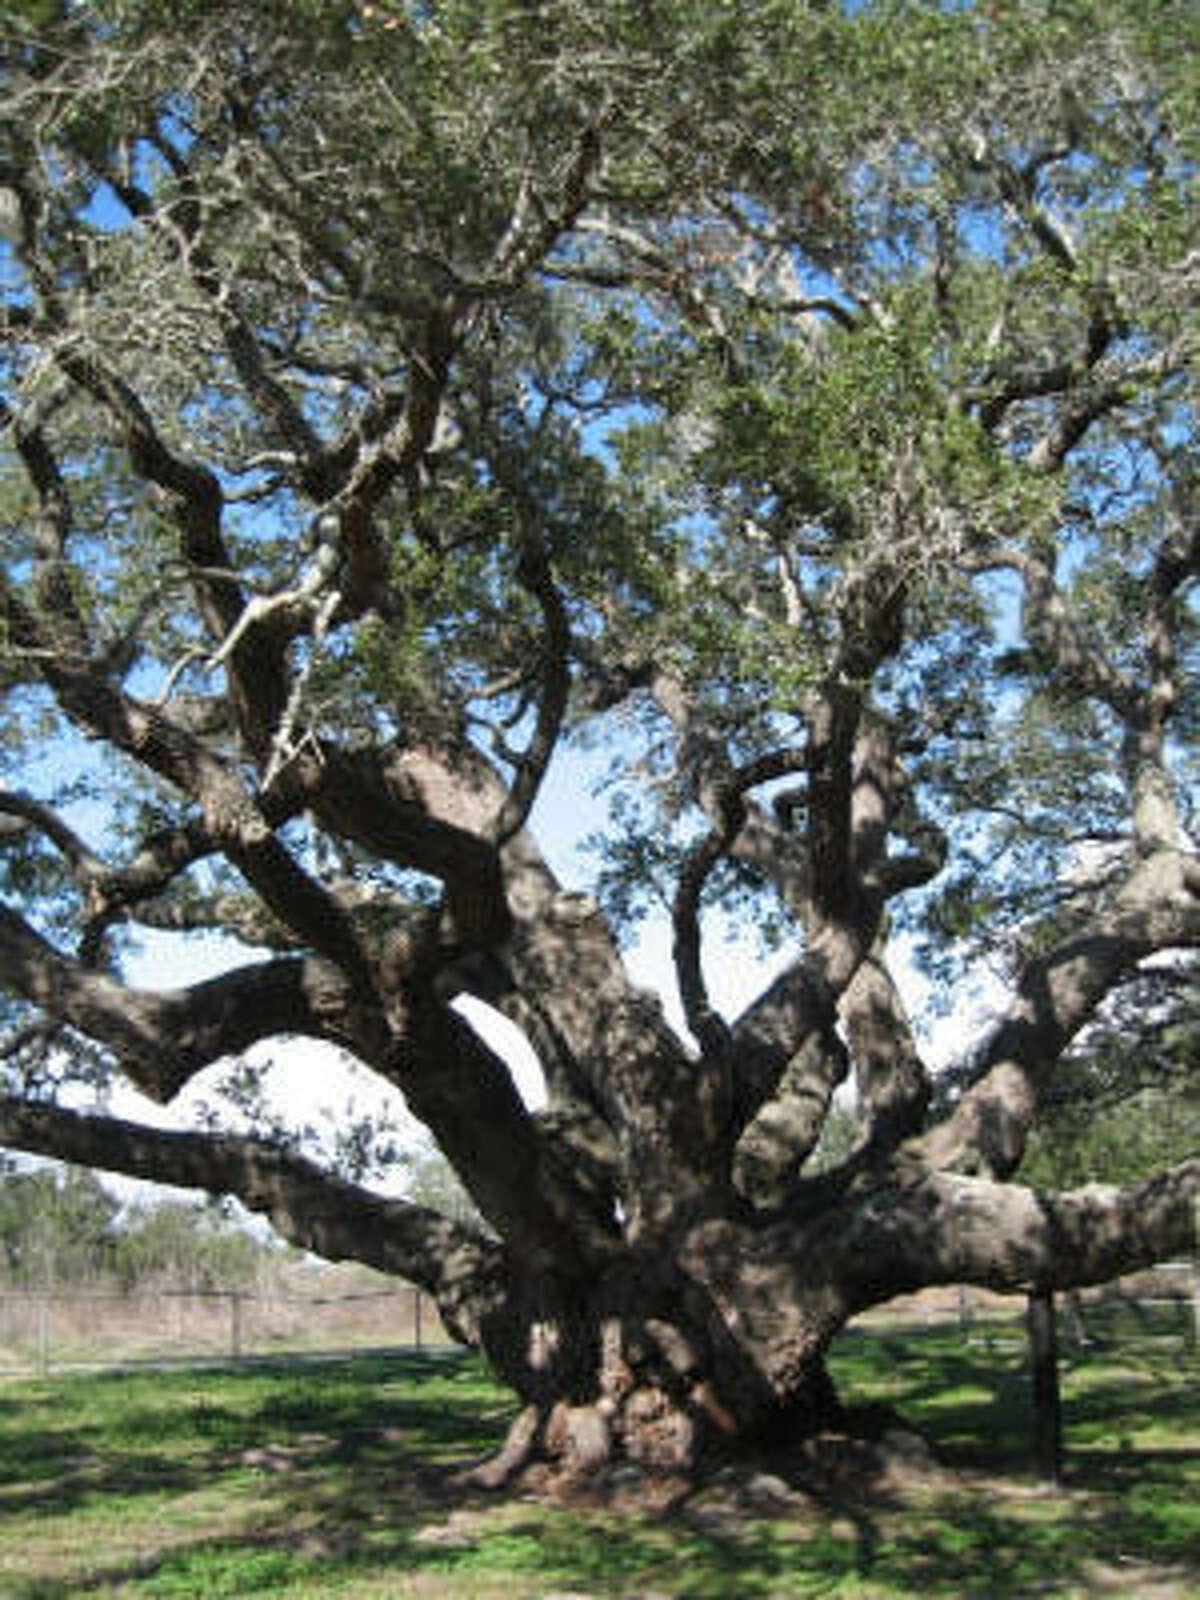 Plant database: Live oak, Quercus virginianaStory: Top 10 trees to survive hurricanes